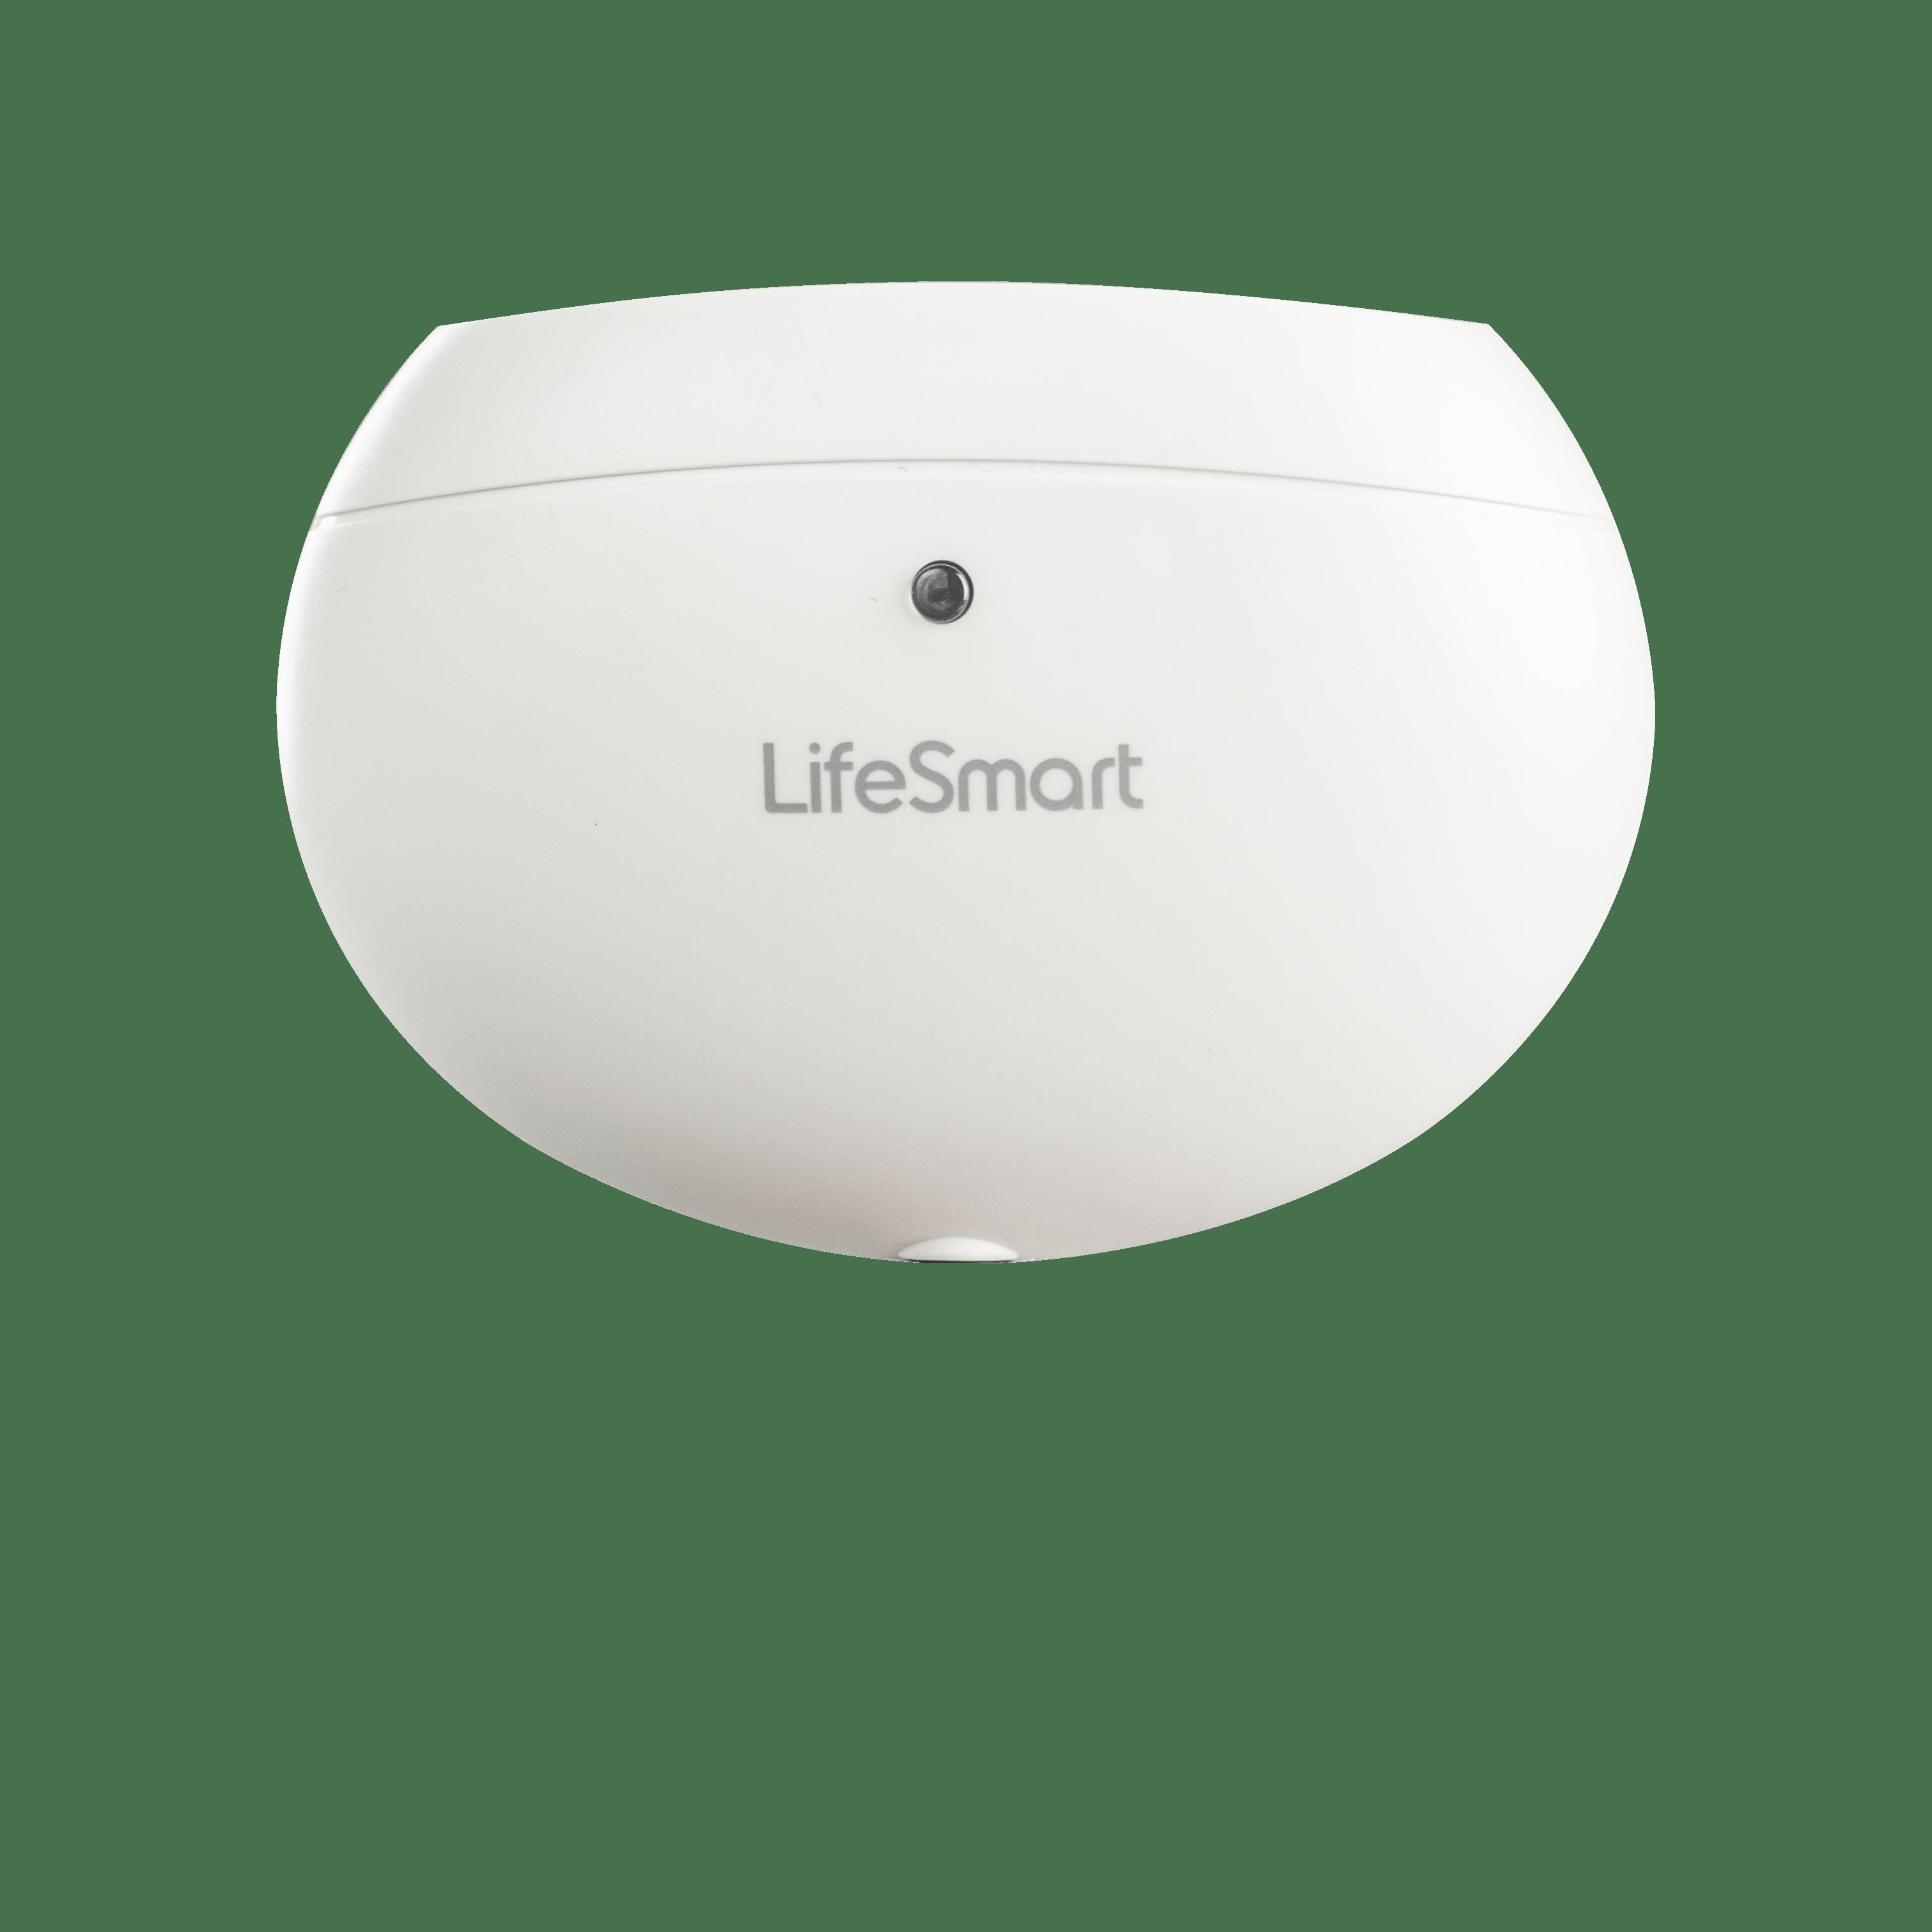 lifesmart-water-leak-sensor-1-iShack